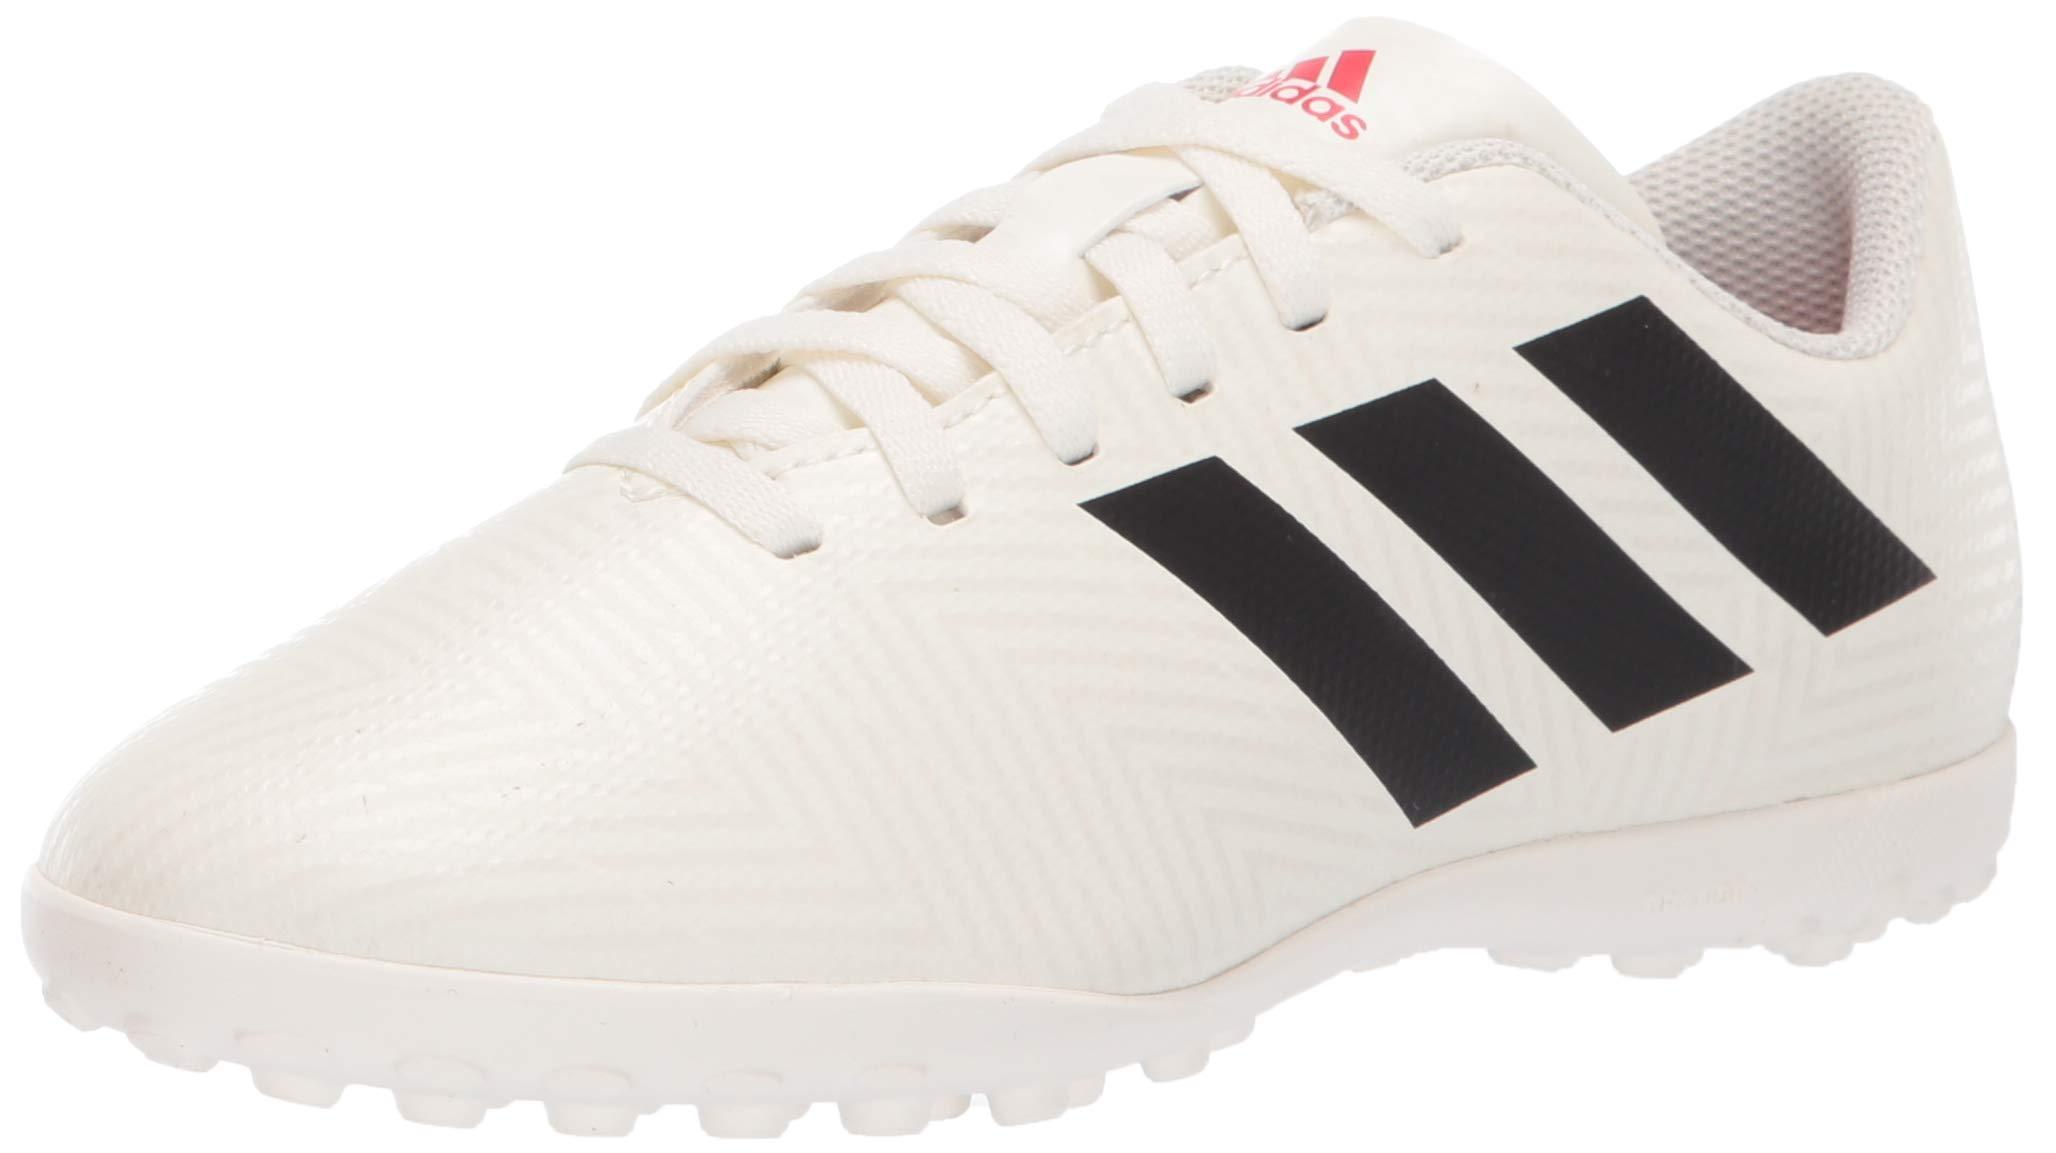 adidas Unisex Nemeziz 18.4 Turf, Off White/Black/Active red, 3.5 M US Big Kid